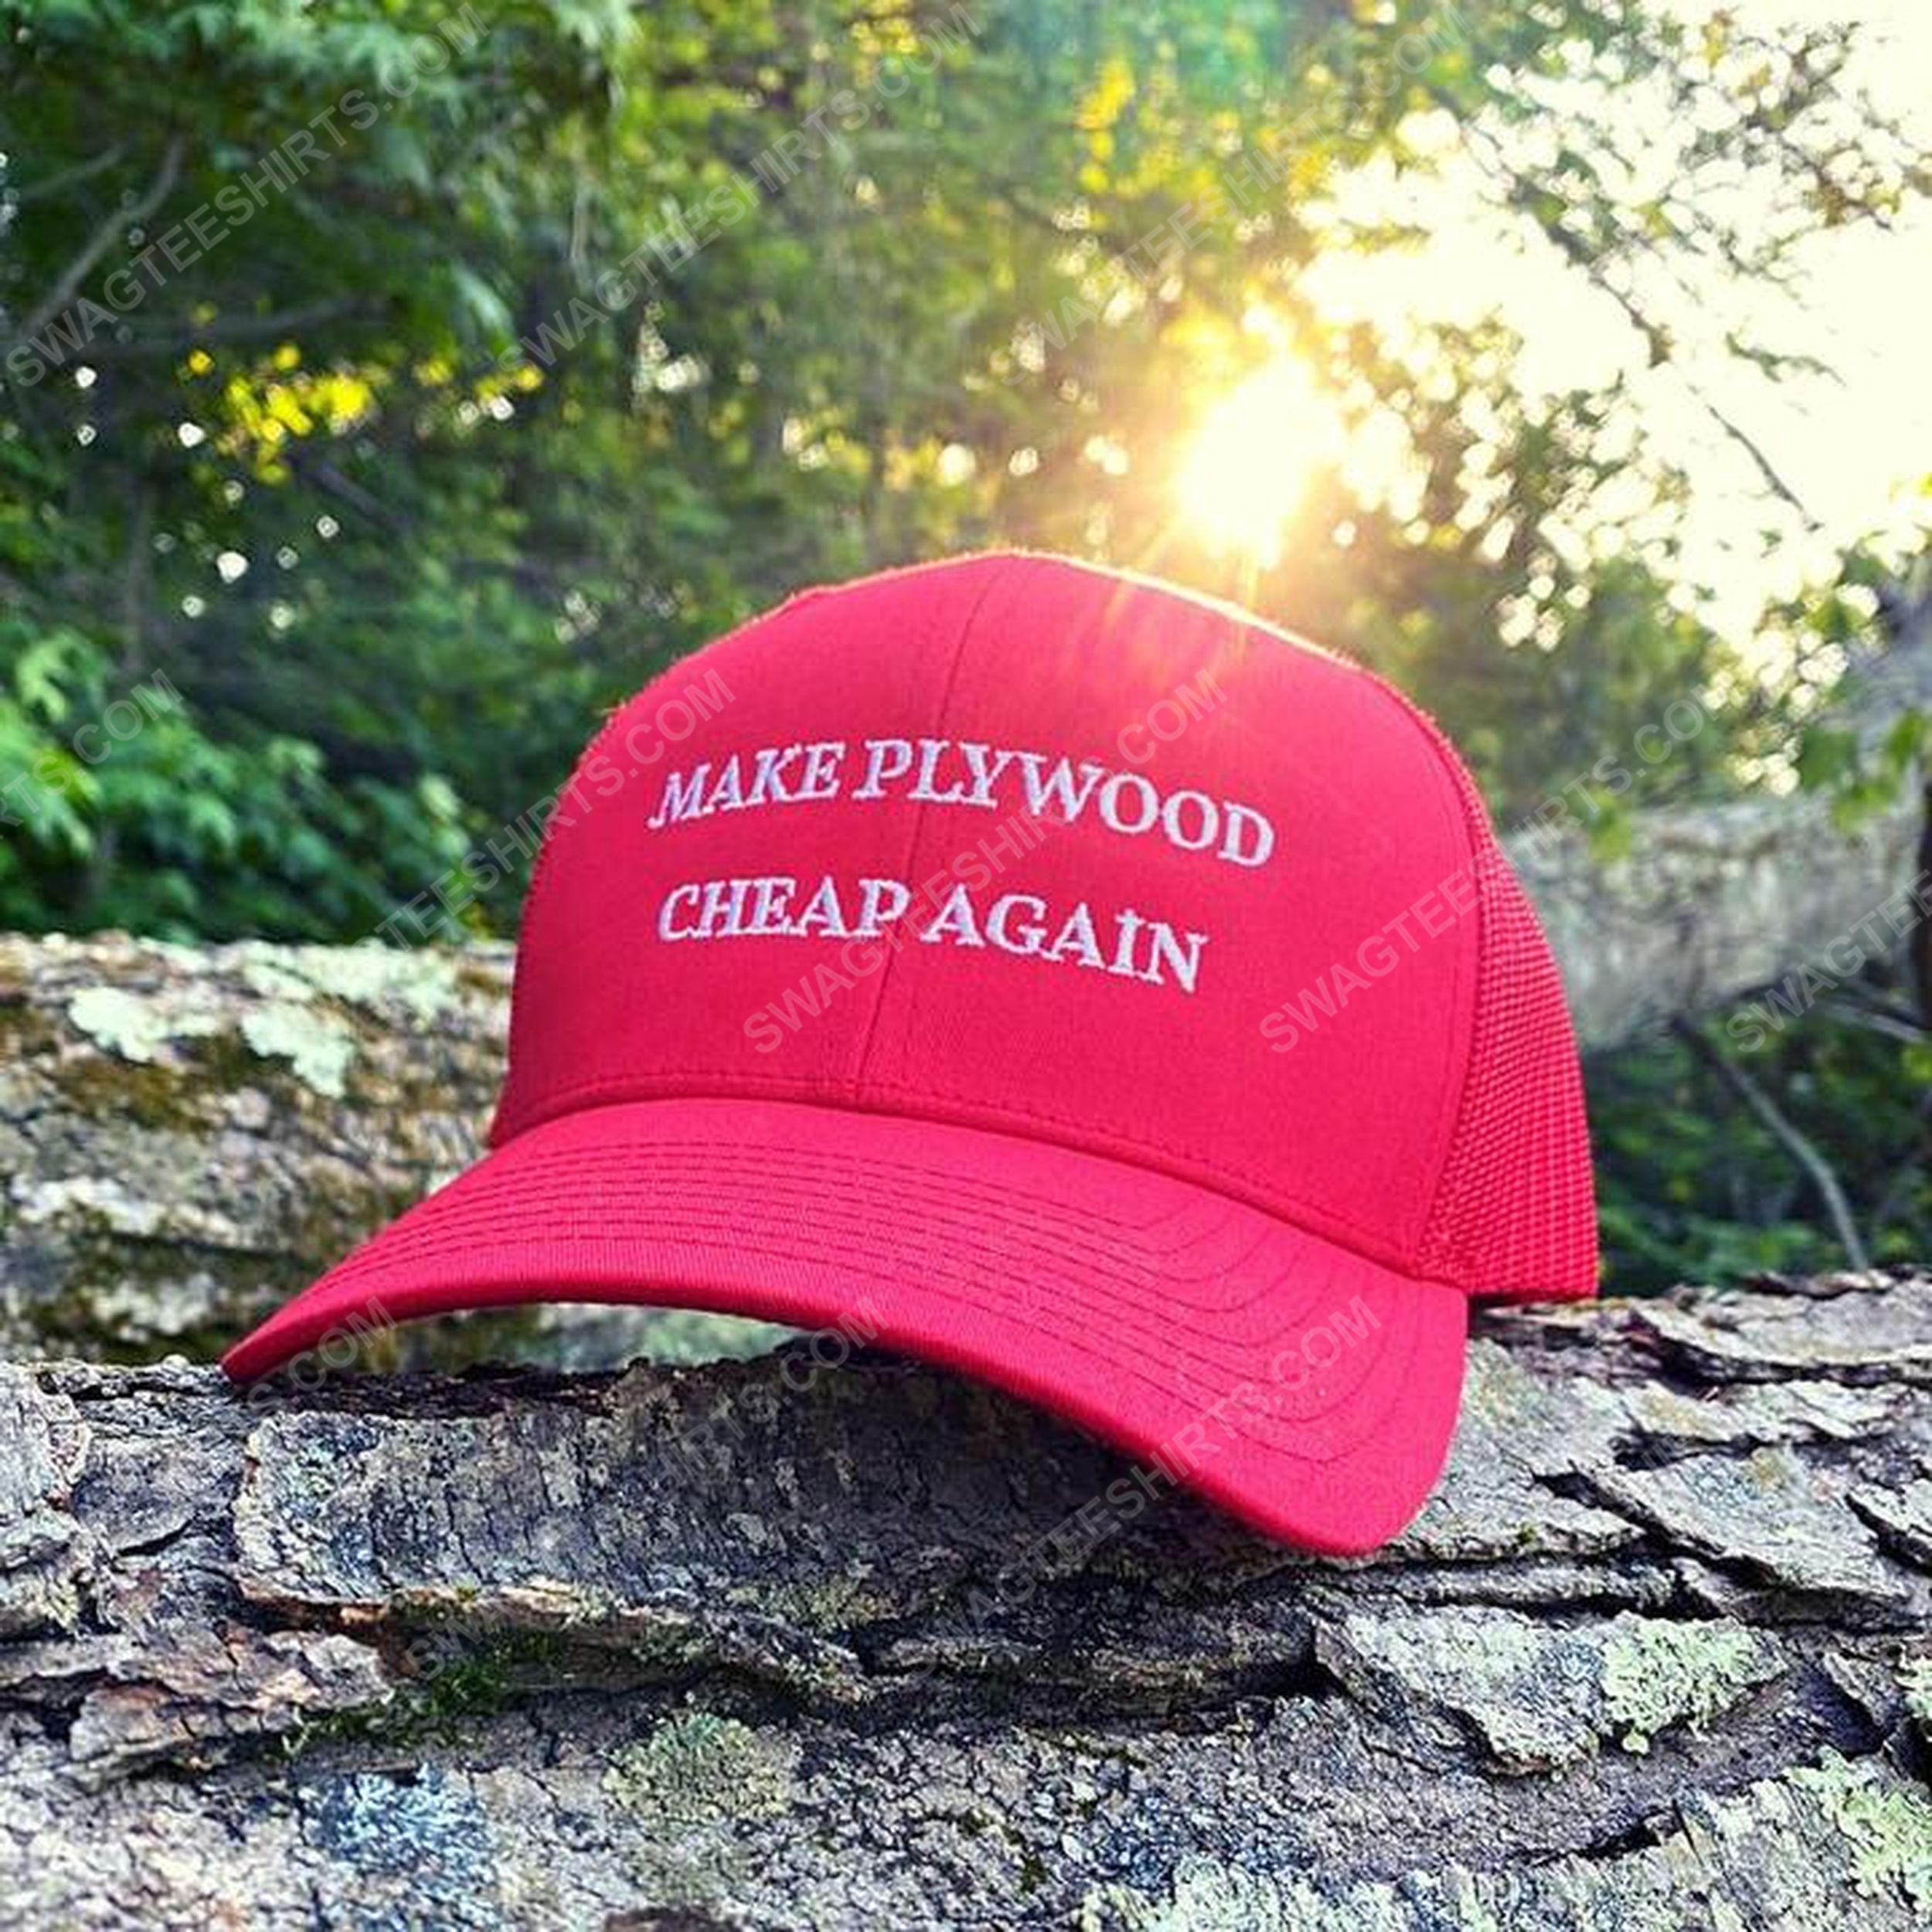 Make plywood cheap again full print classic hat 1